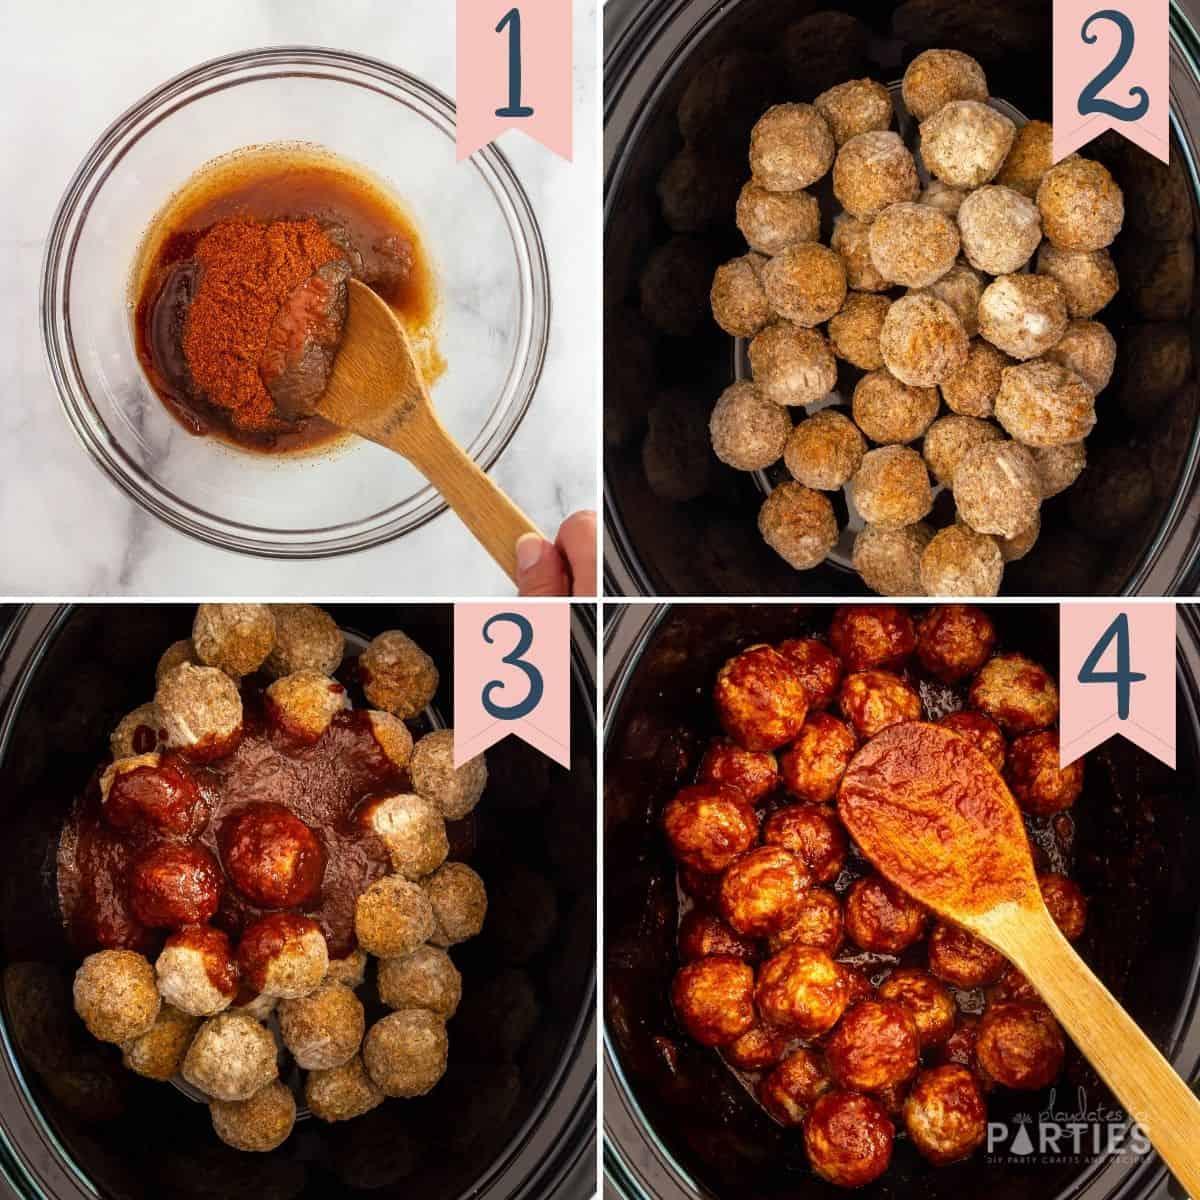 how to make crockpot meatballs